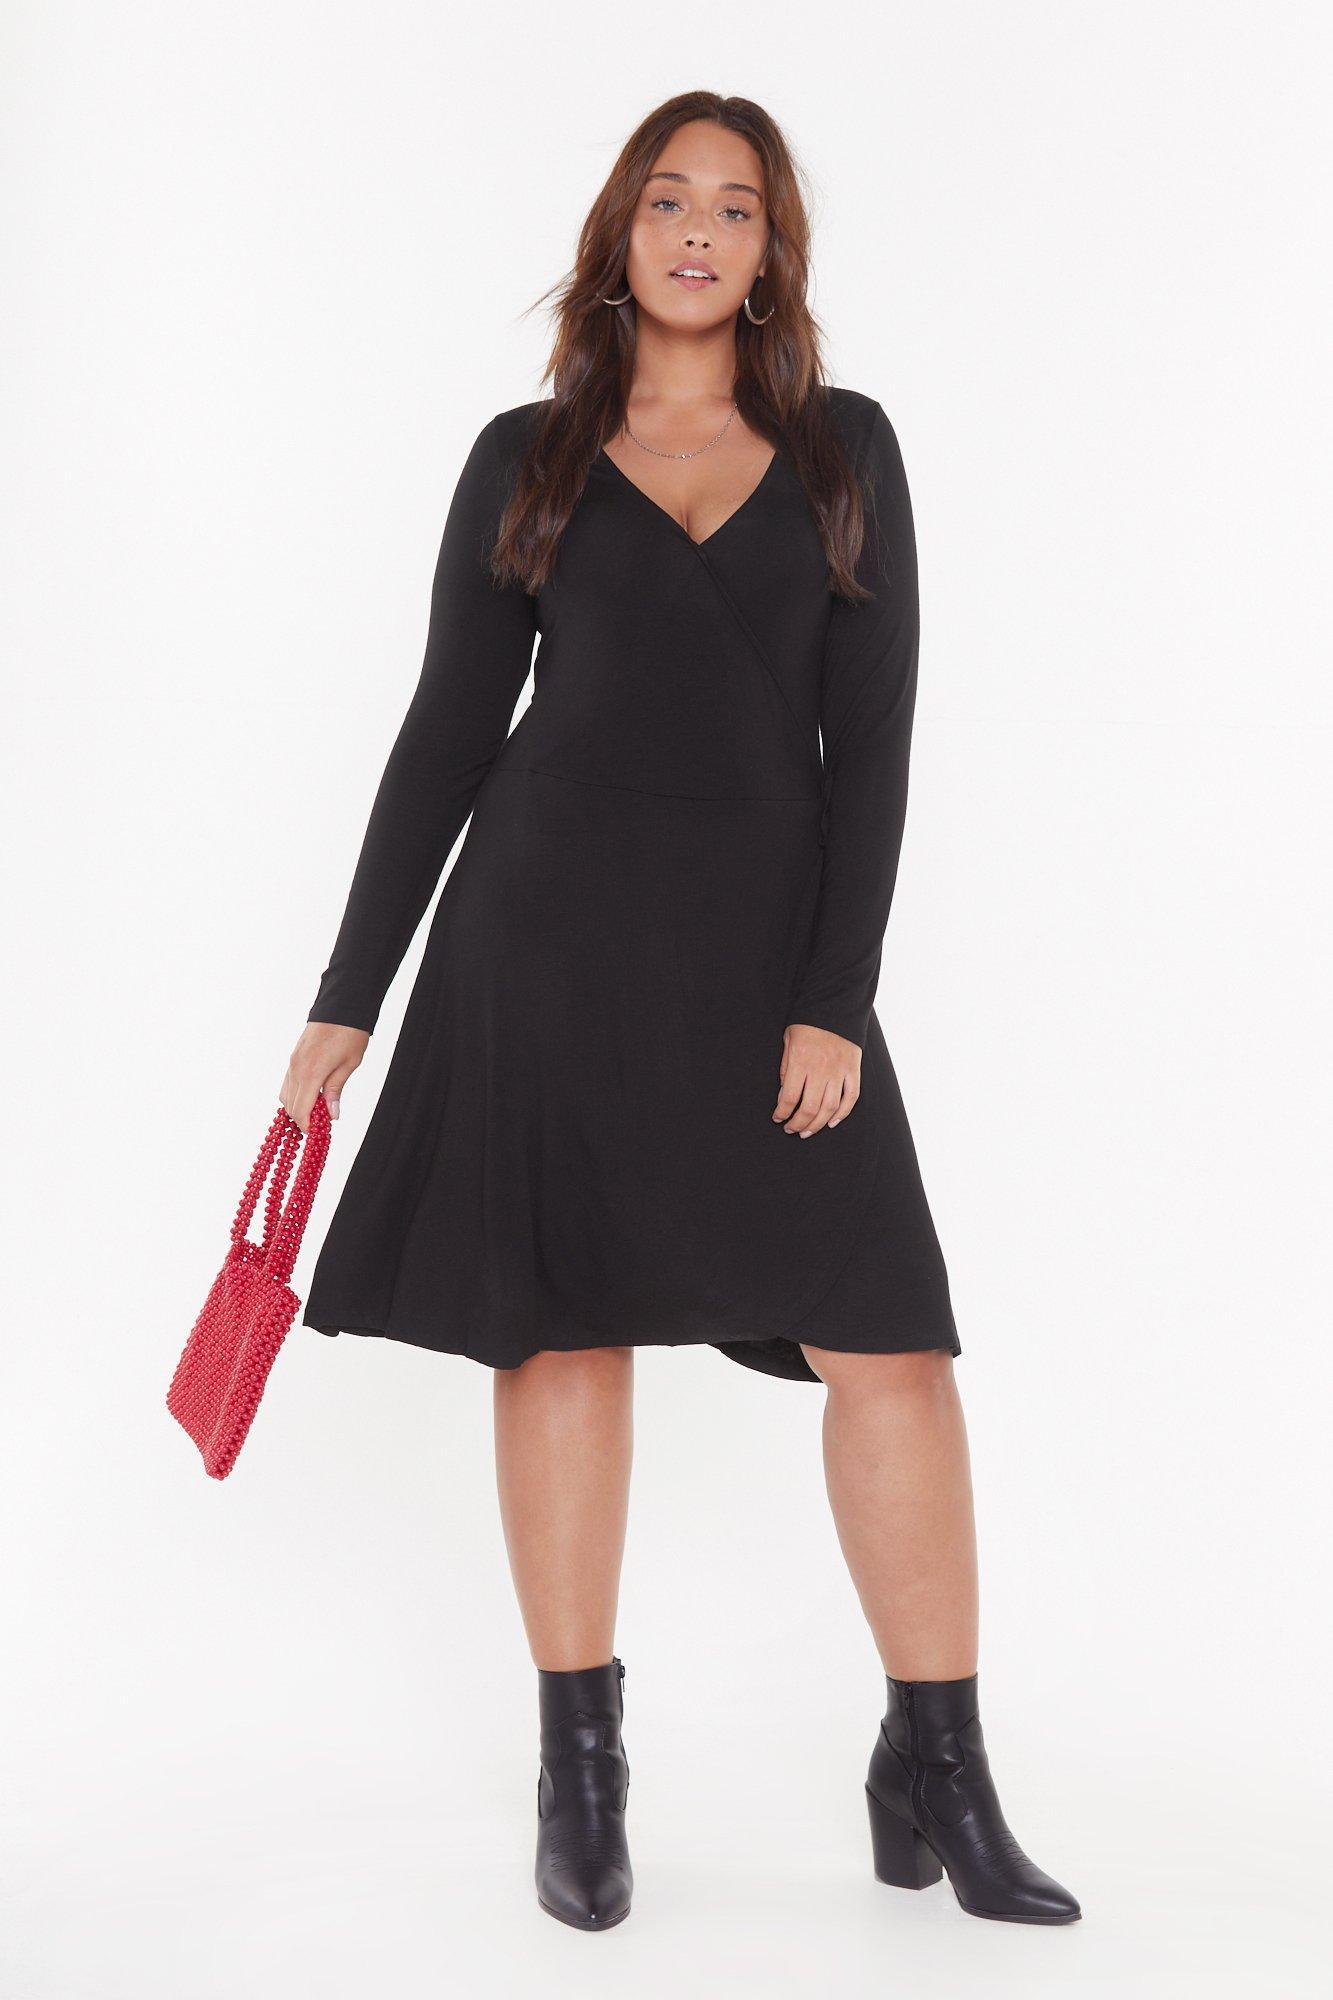 A Plus Looks Wrap Jersey Dress 6